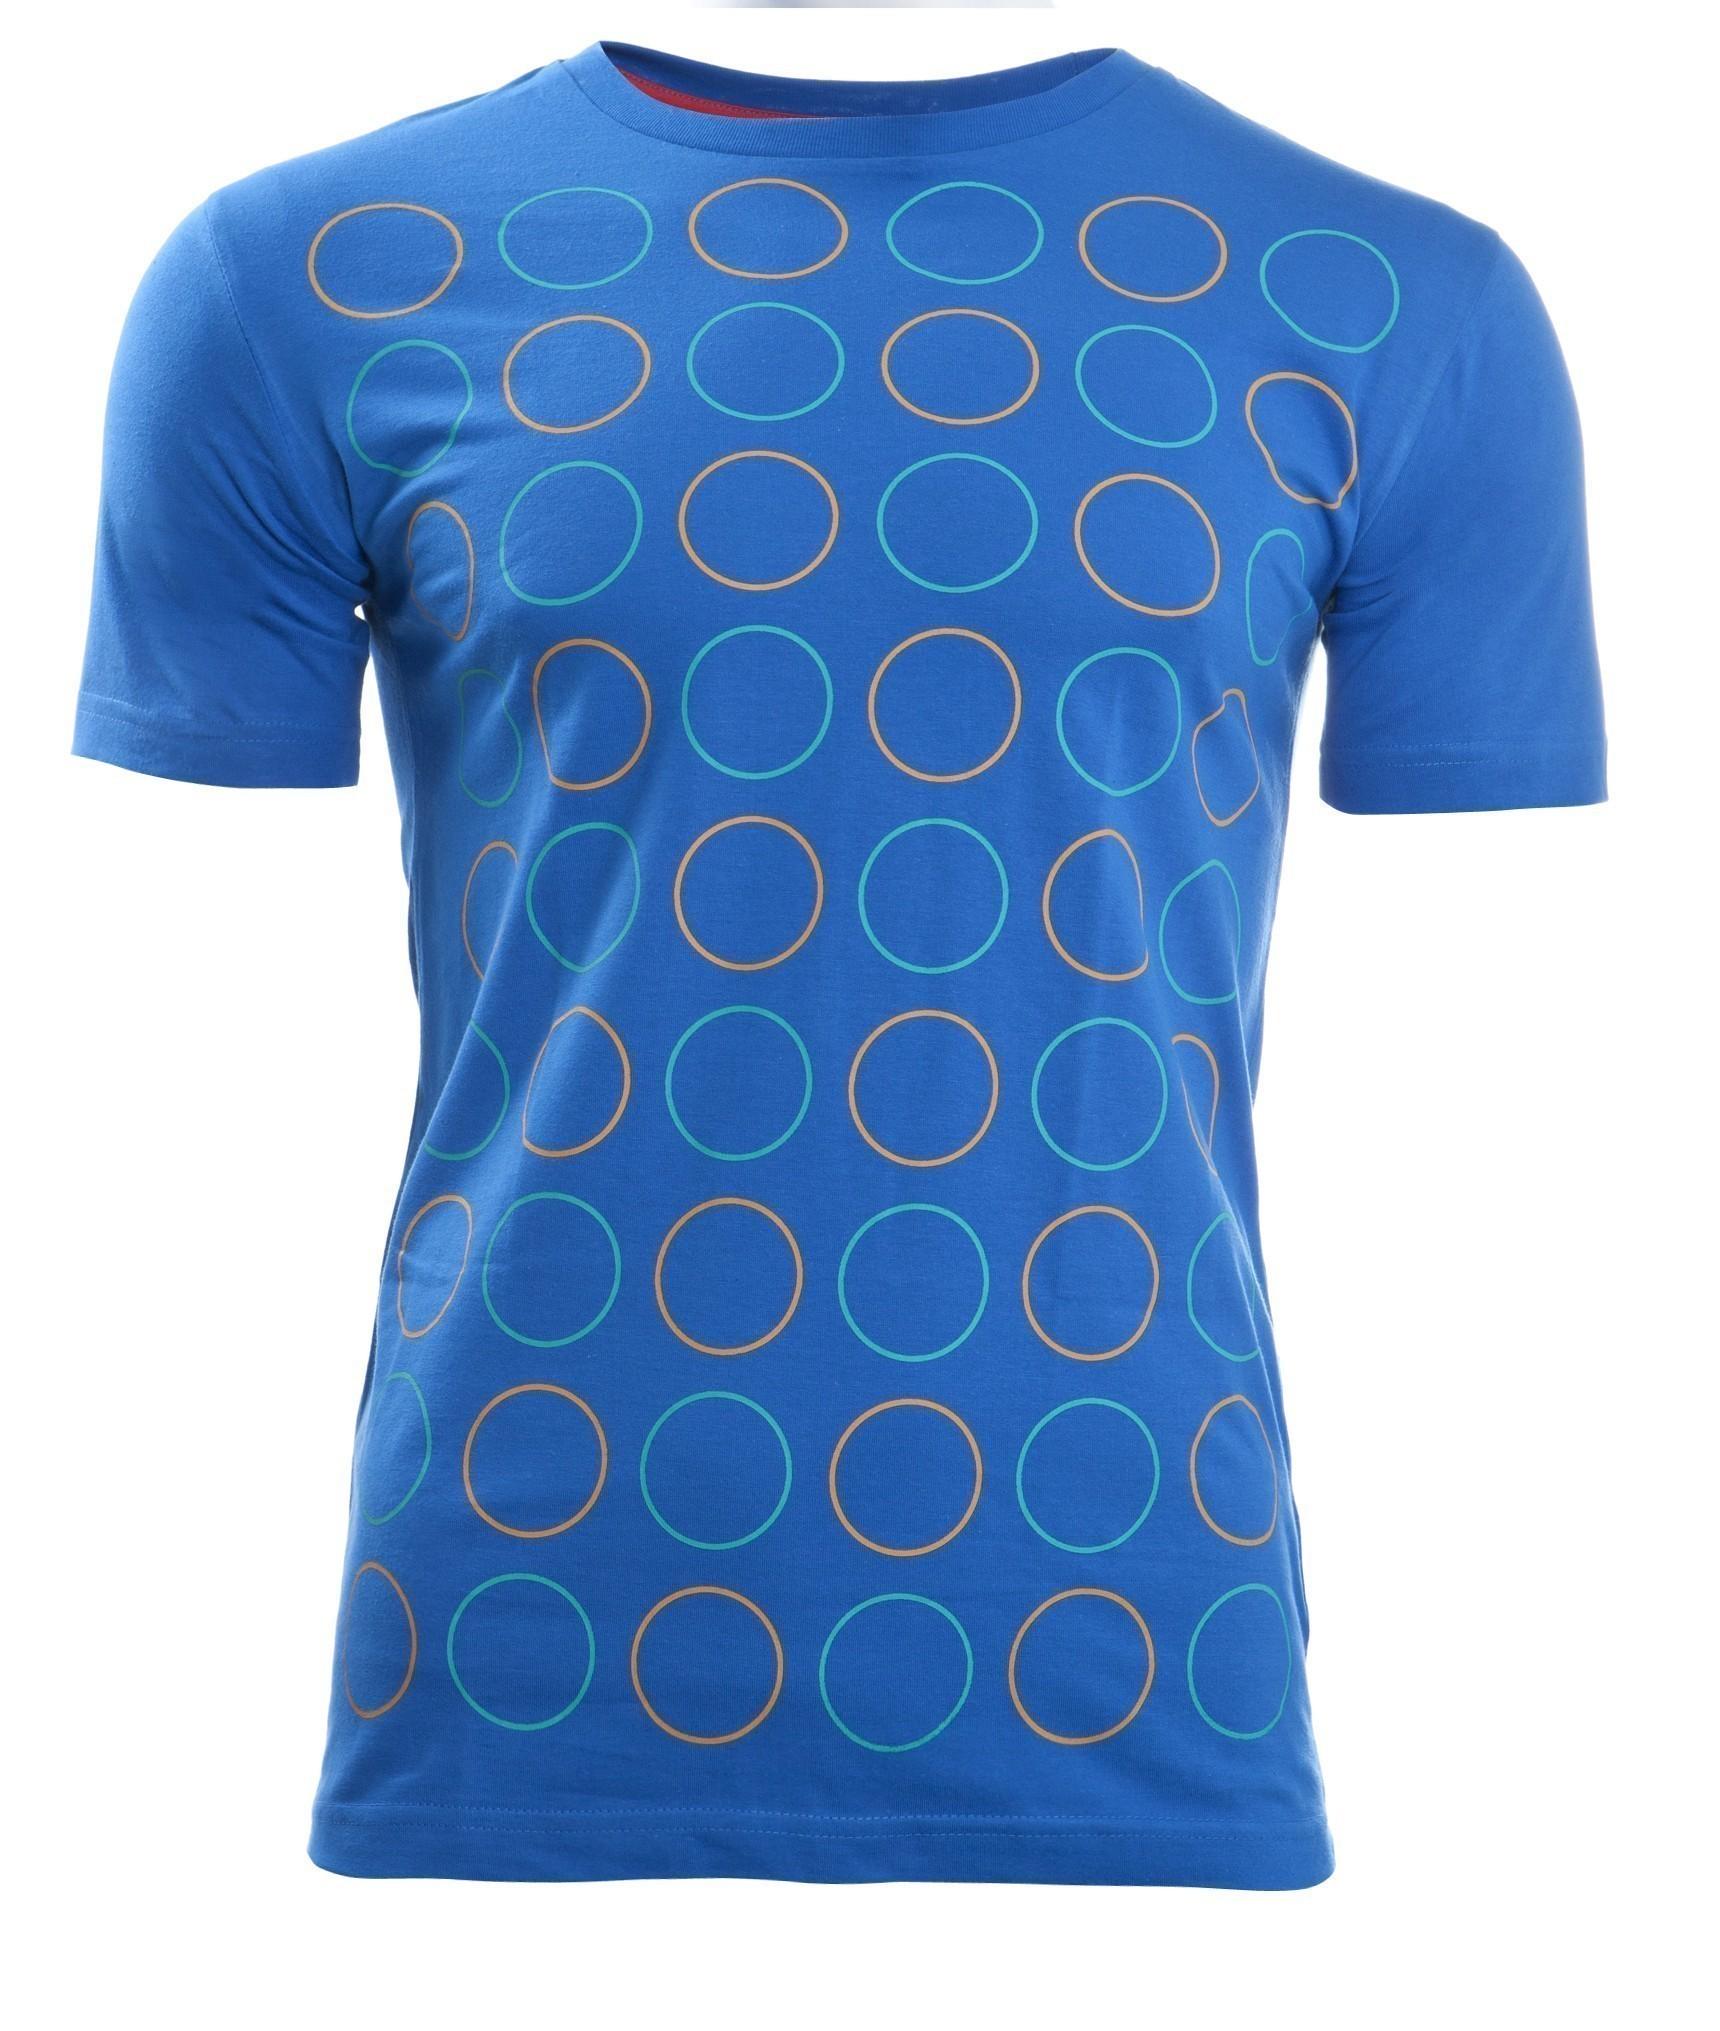 Thokkthokk twin polka t shirt french blue t shirts for French blue t shirt